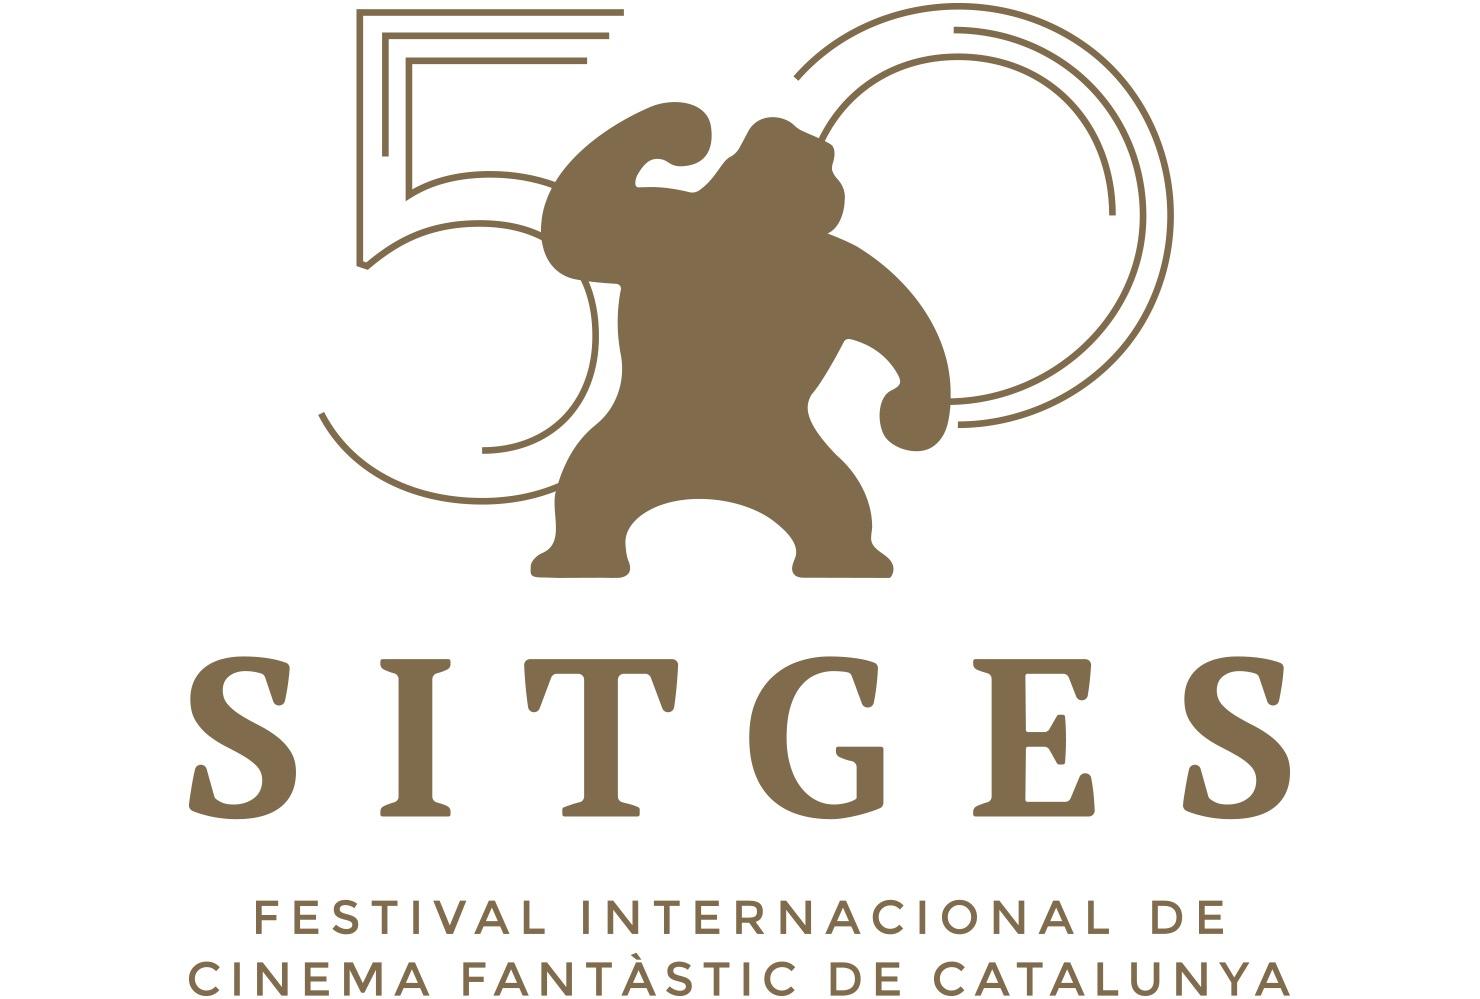 Publicar-un-libro-editar-Madrid-Barcelona-España-Cataluña-Catalunya-català-Andalucia-coedicion-autoedicion-tradicional-manuscrito-cine-festival-sitges-escritores-internacional-cinema-logo